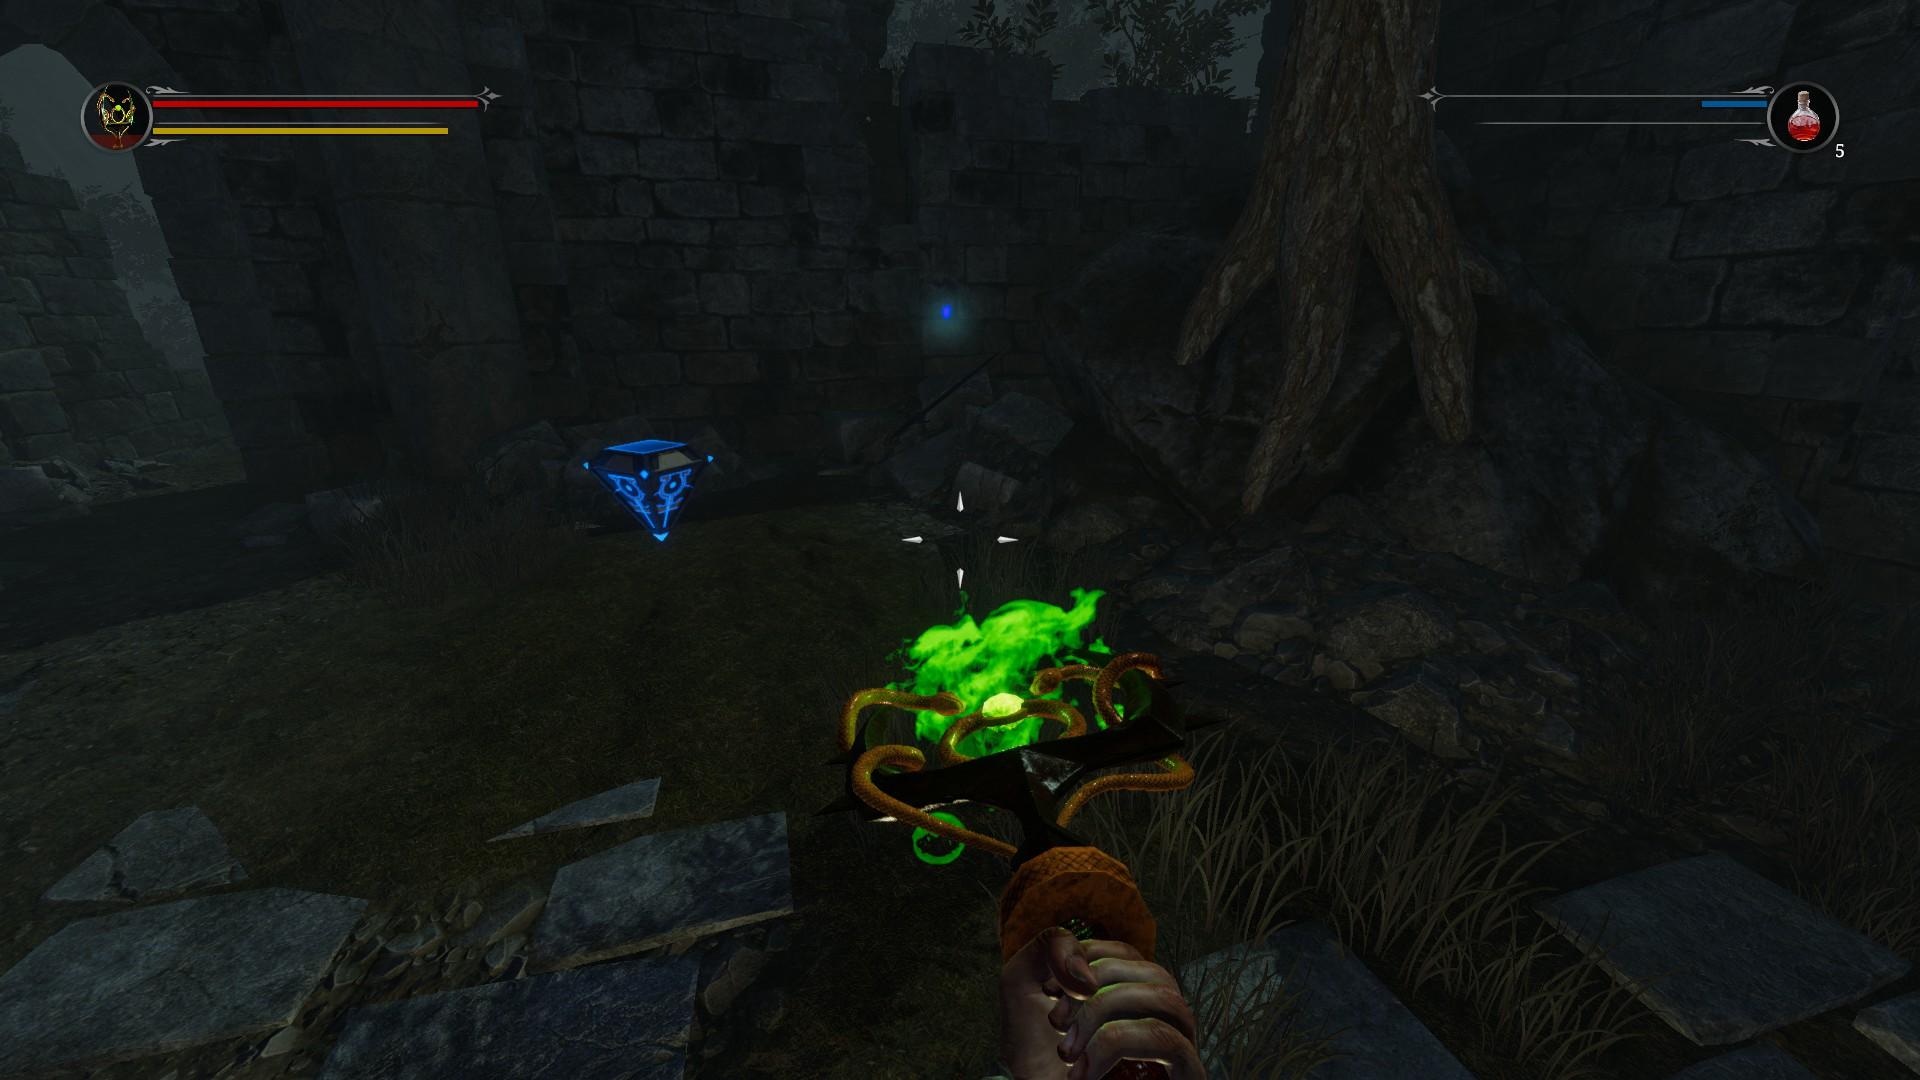 Drop ennemis - GeekAnimea